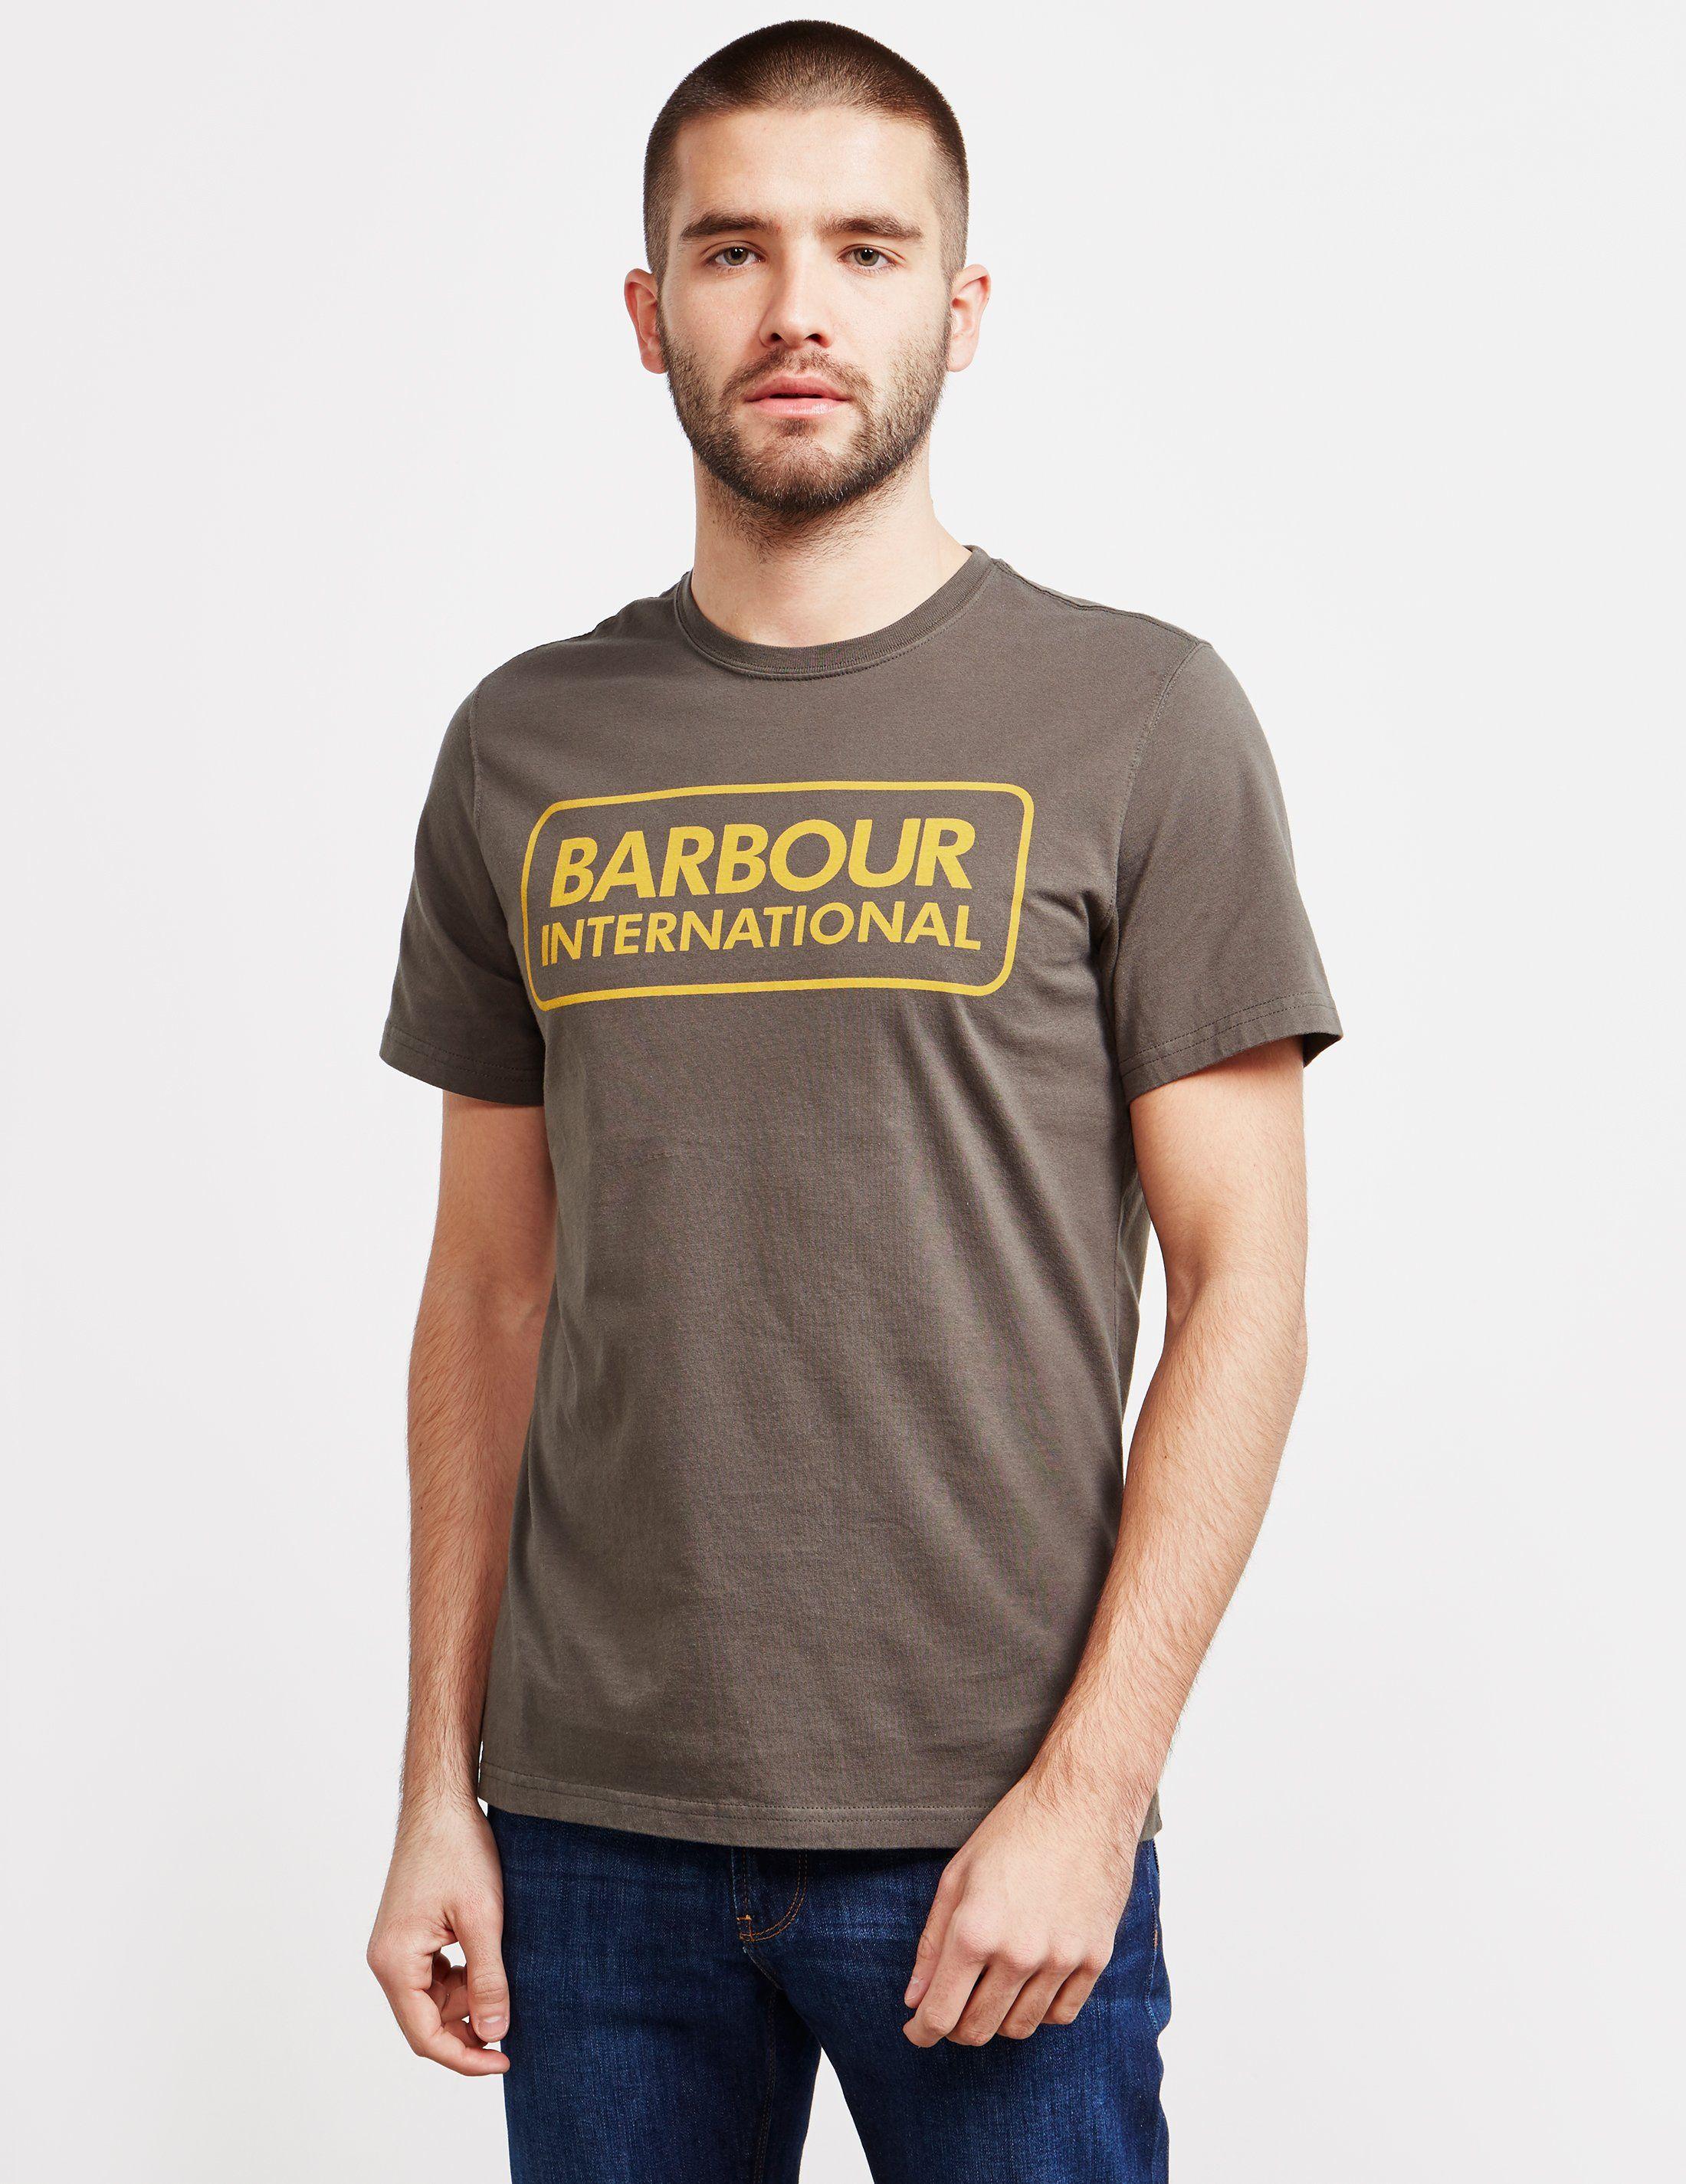 Barbour International Logo Short Sleeve T-Shirt